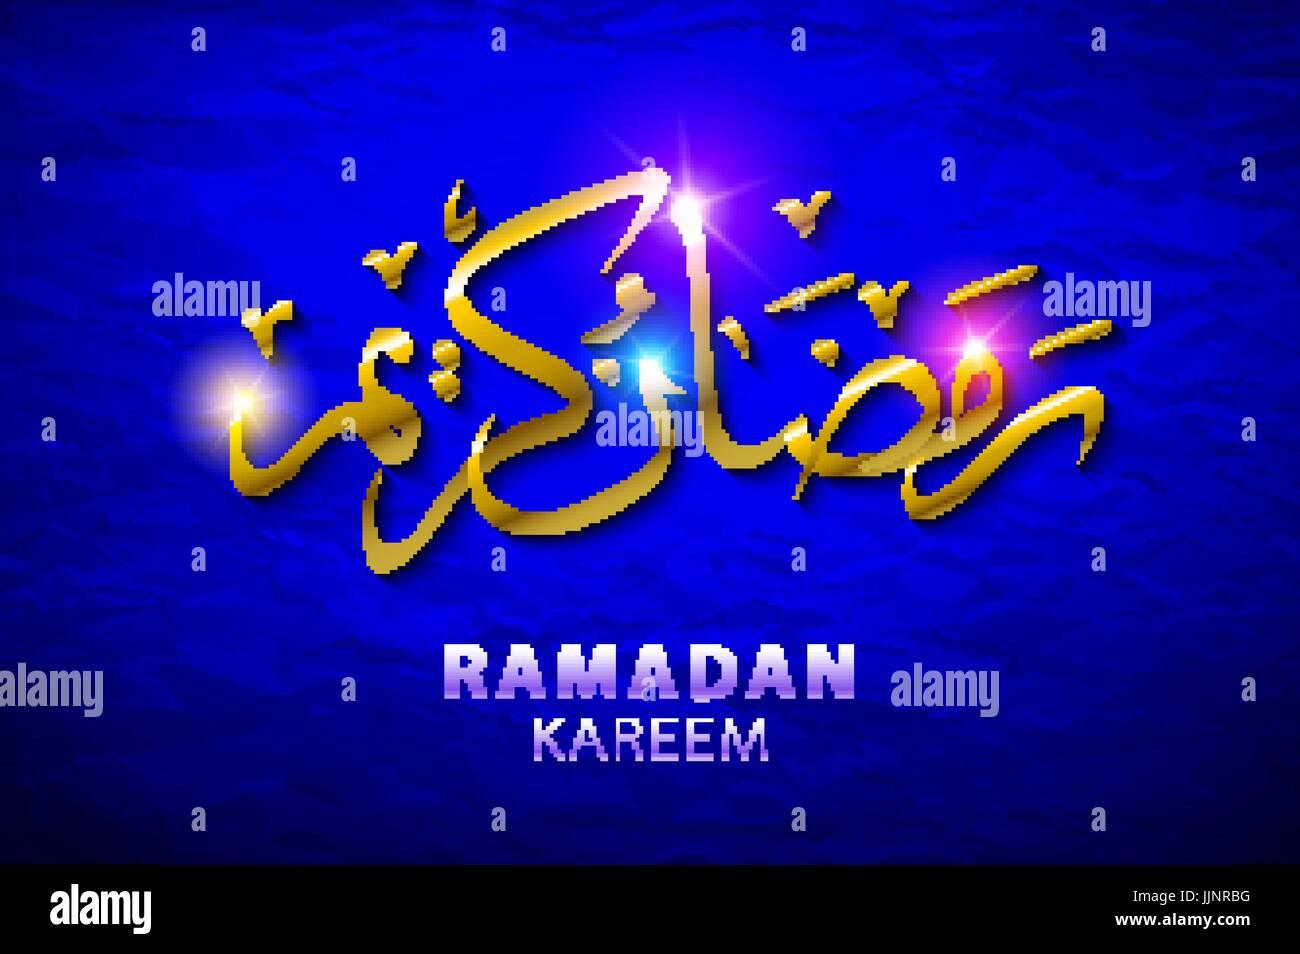 Ramadan greetings in arabic script an islamic greeting card for ramadan greetings in arabic script an islamic greeting card for holy month of ramadan kareem eps 10 vector illustration art kristyandbryce Images